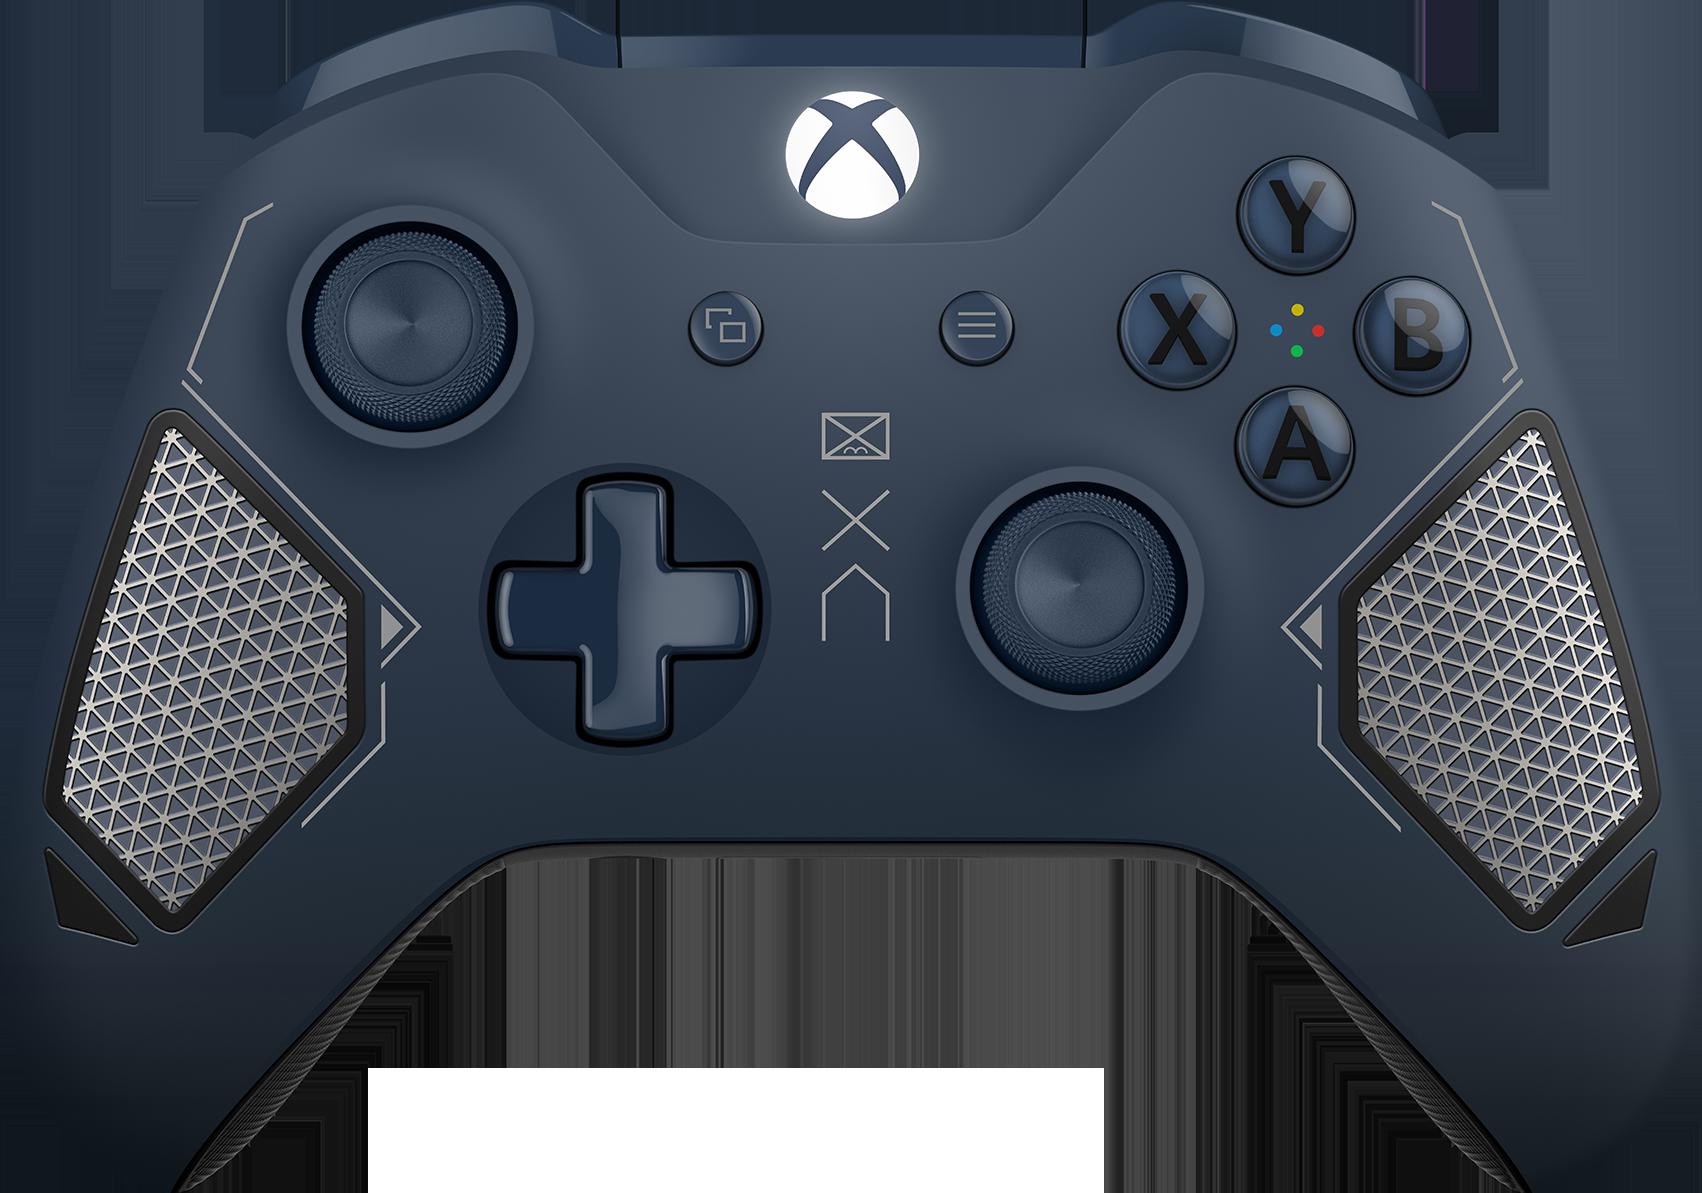 Xbox Wireless Controller - Patrol Tech Special Edition